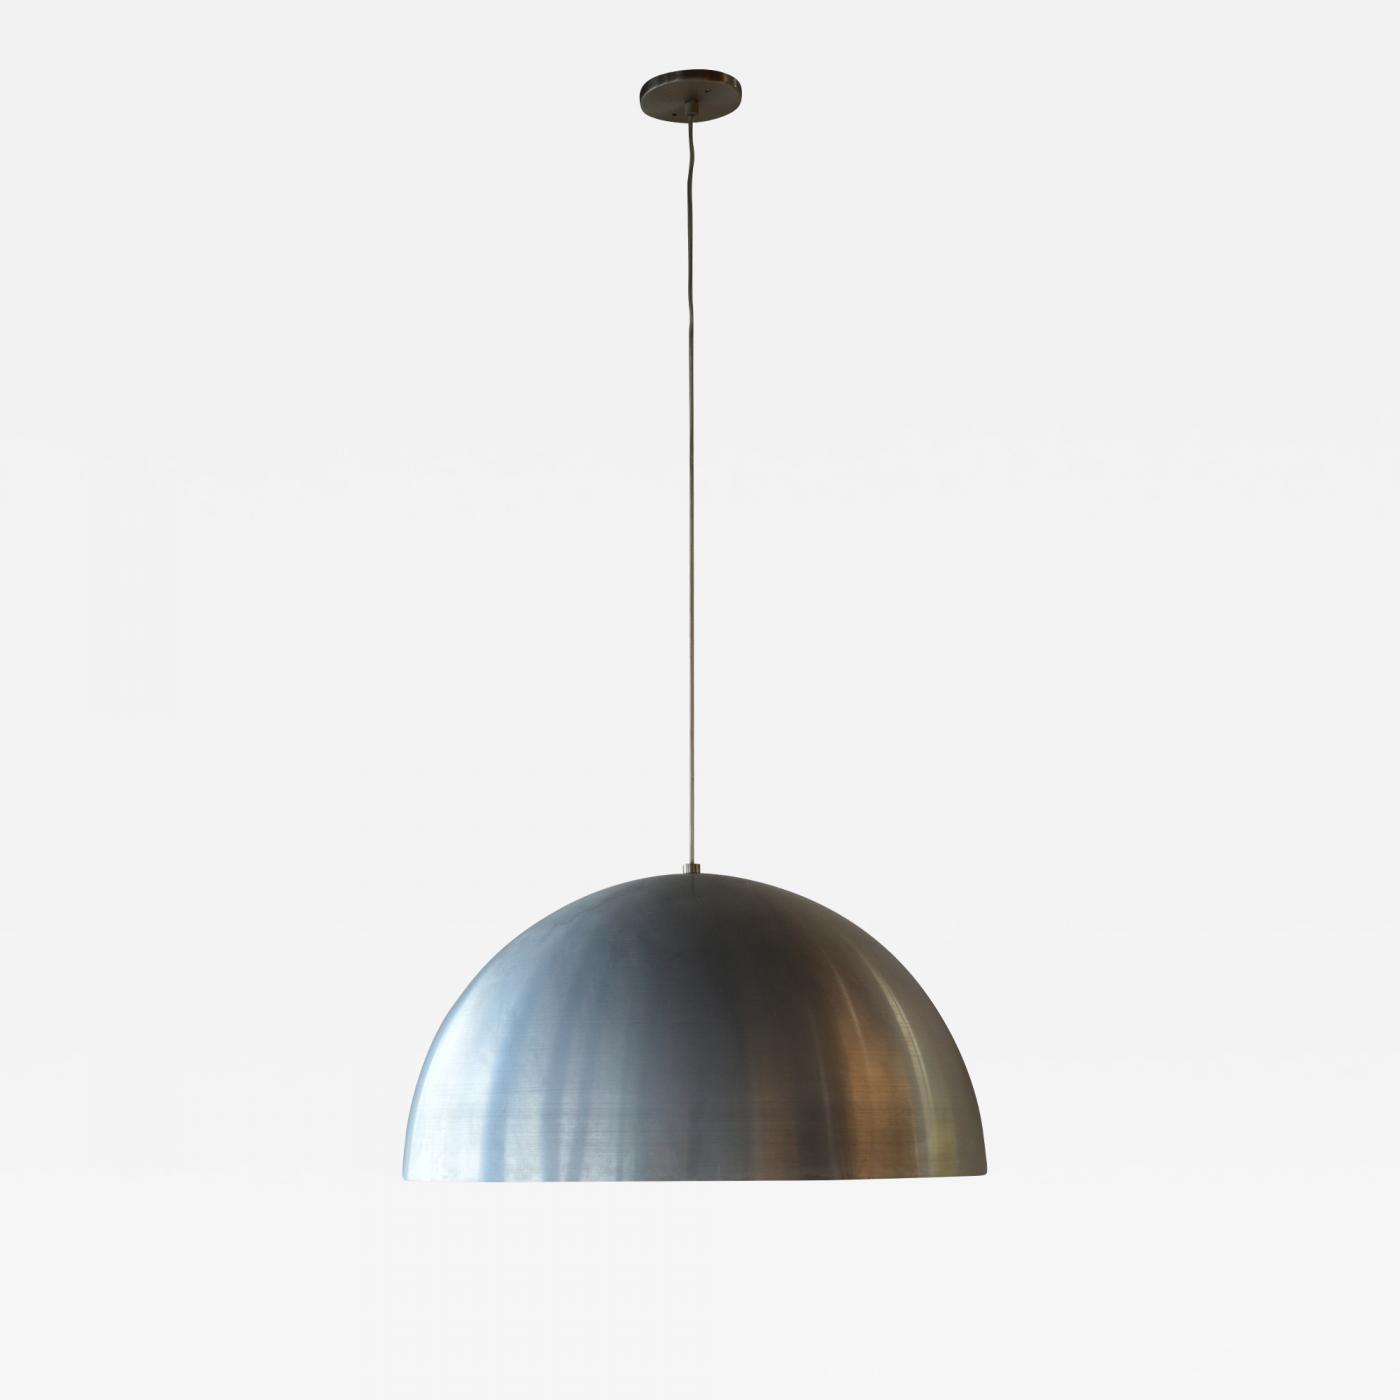 Listings / Furniture / Lighting / Chandeliers And Pendants